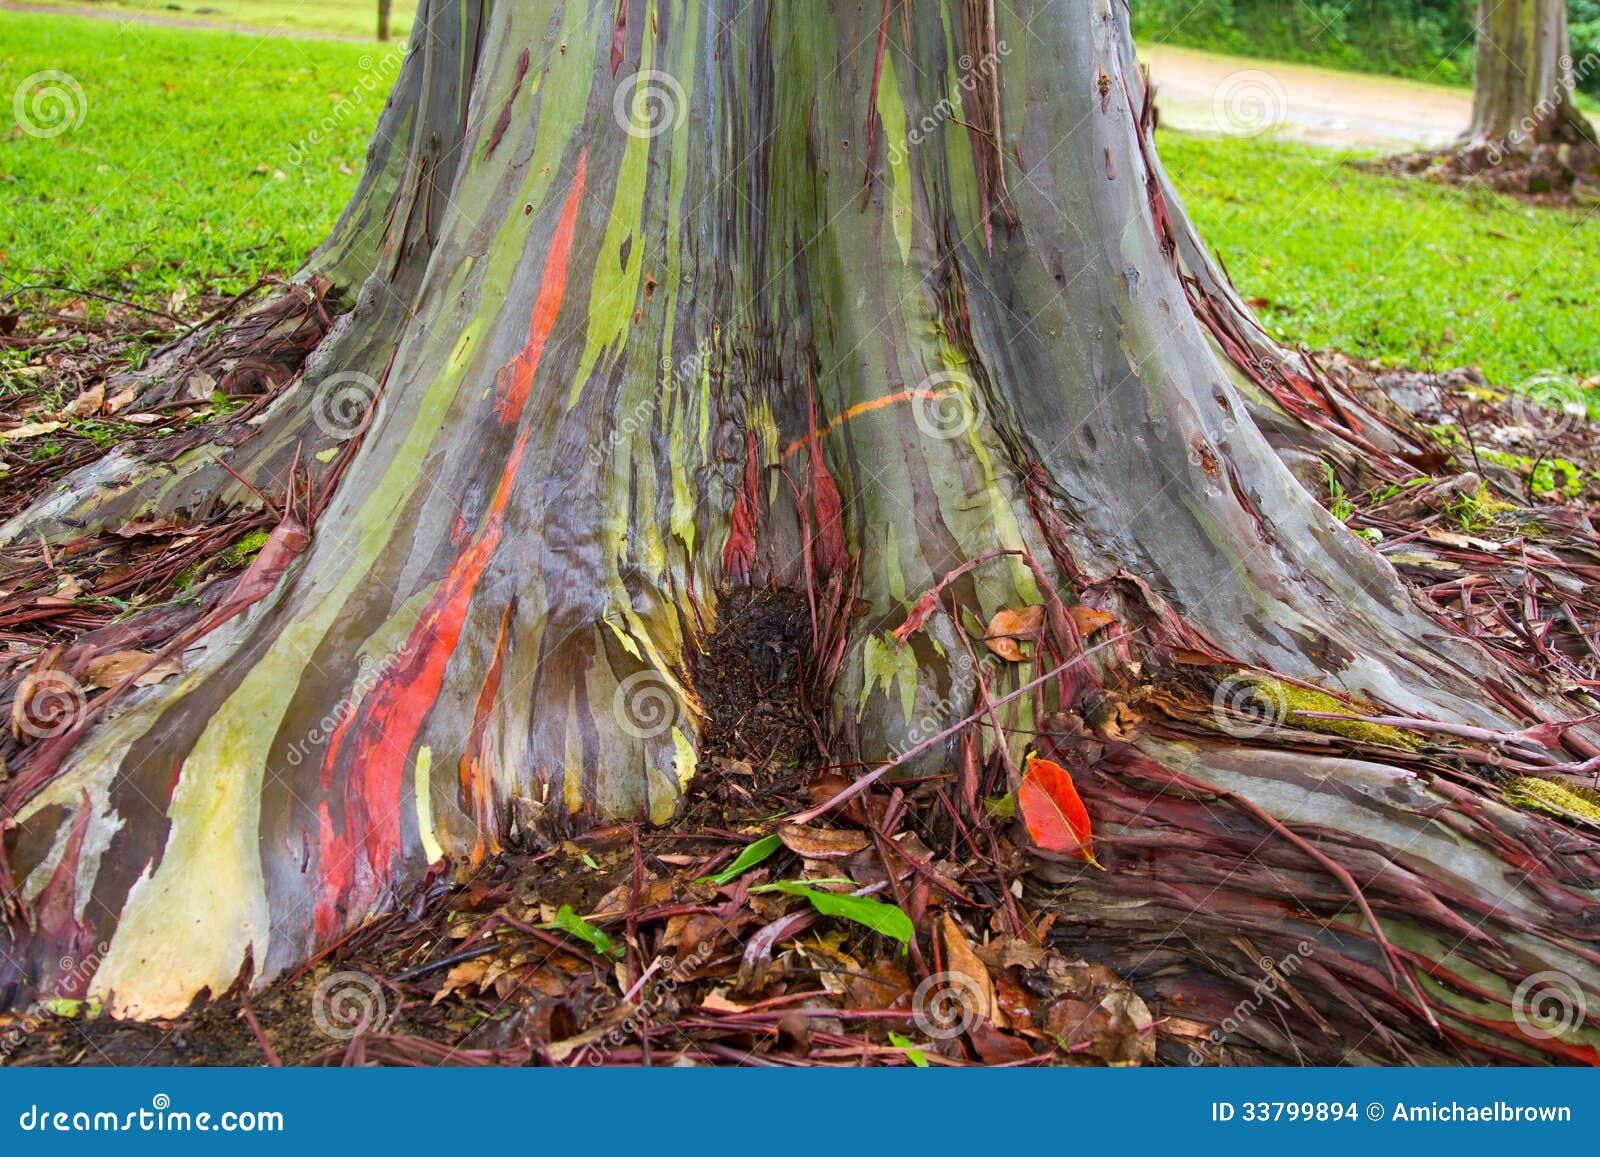 Rainbow Painted Gum Eucalyptus Tree Stock Images Image 33799894